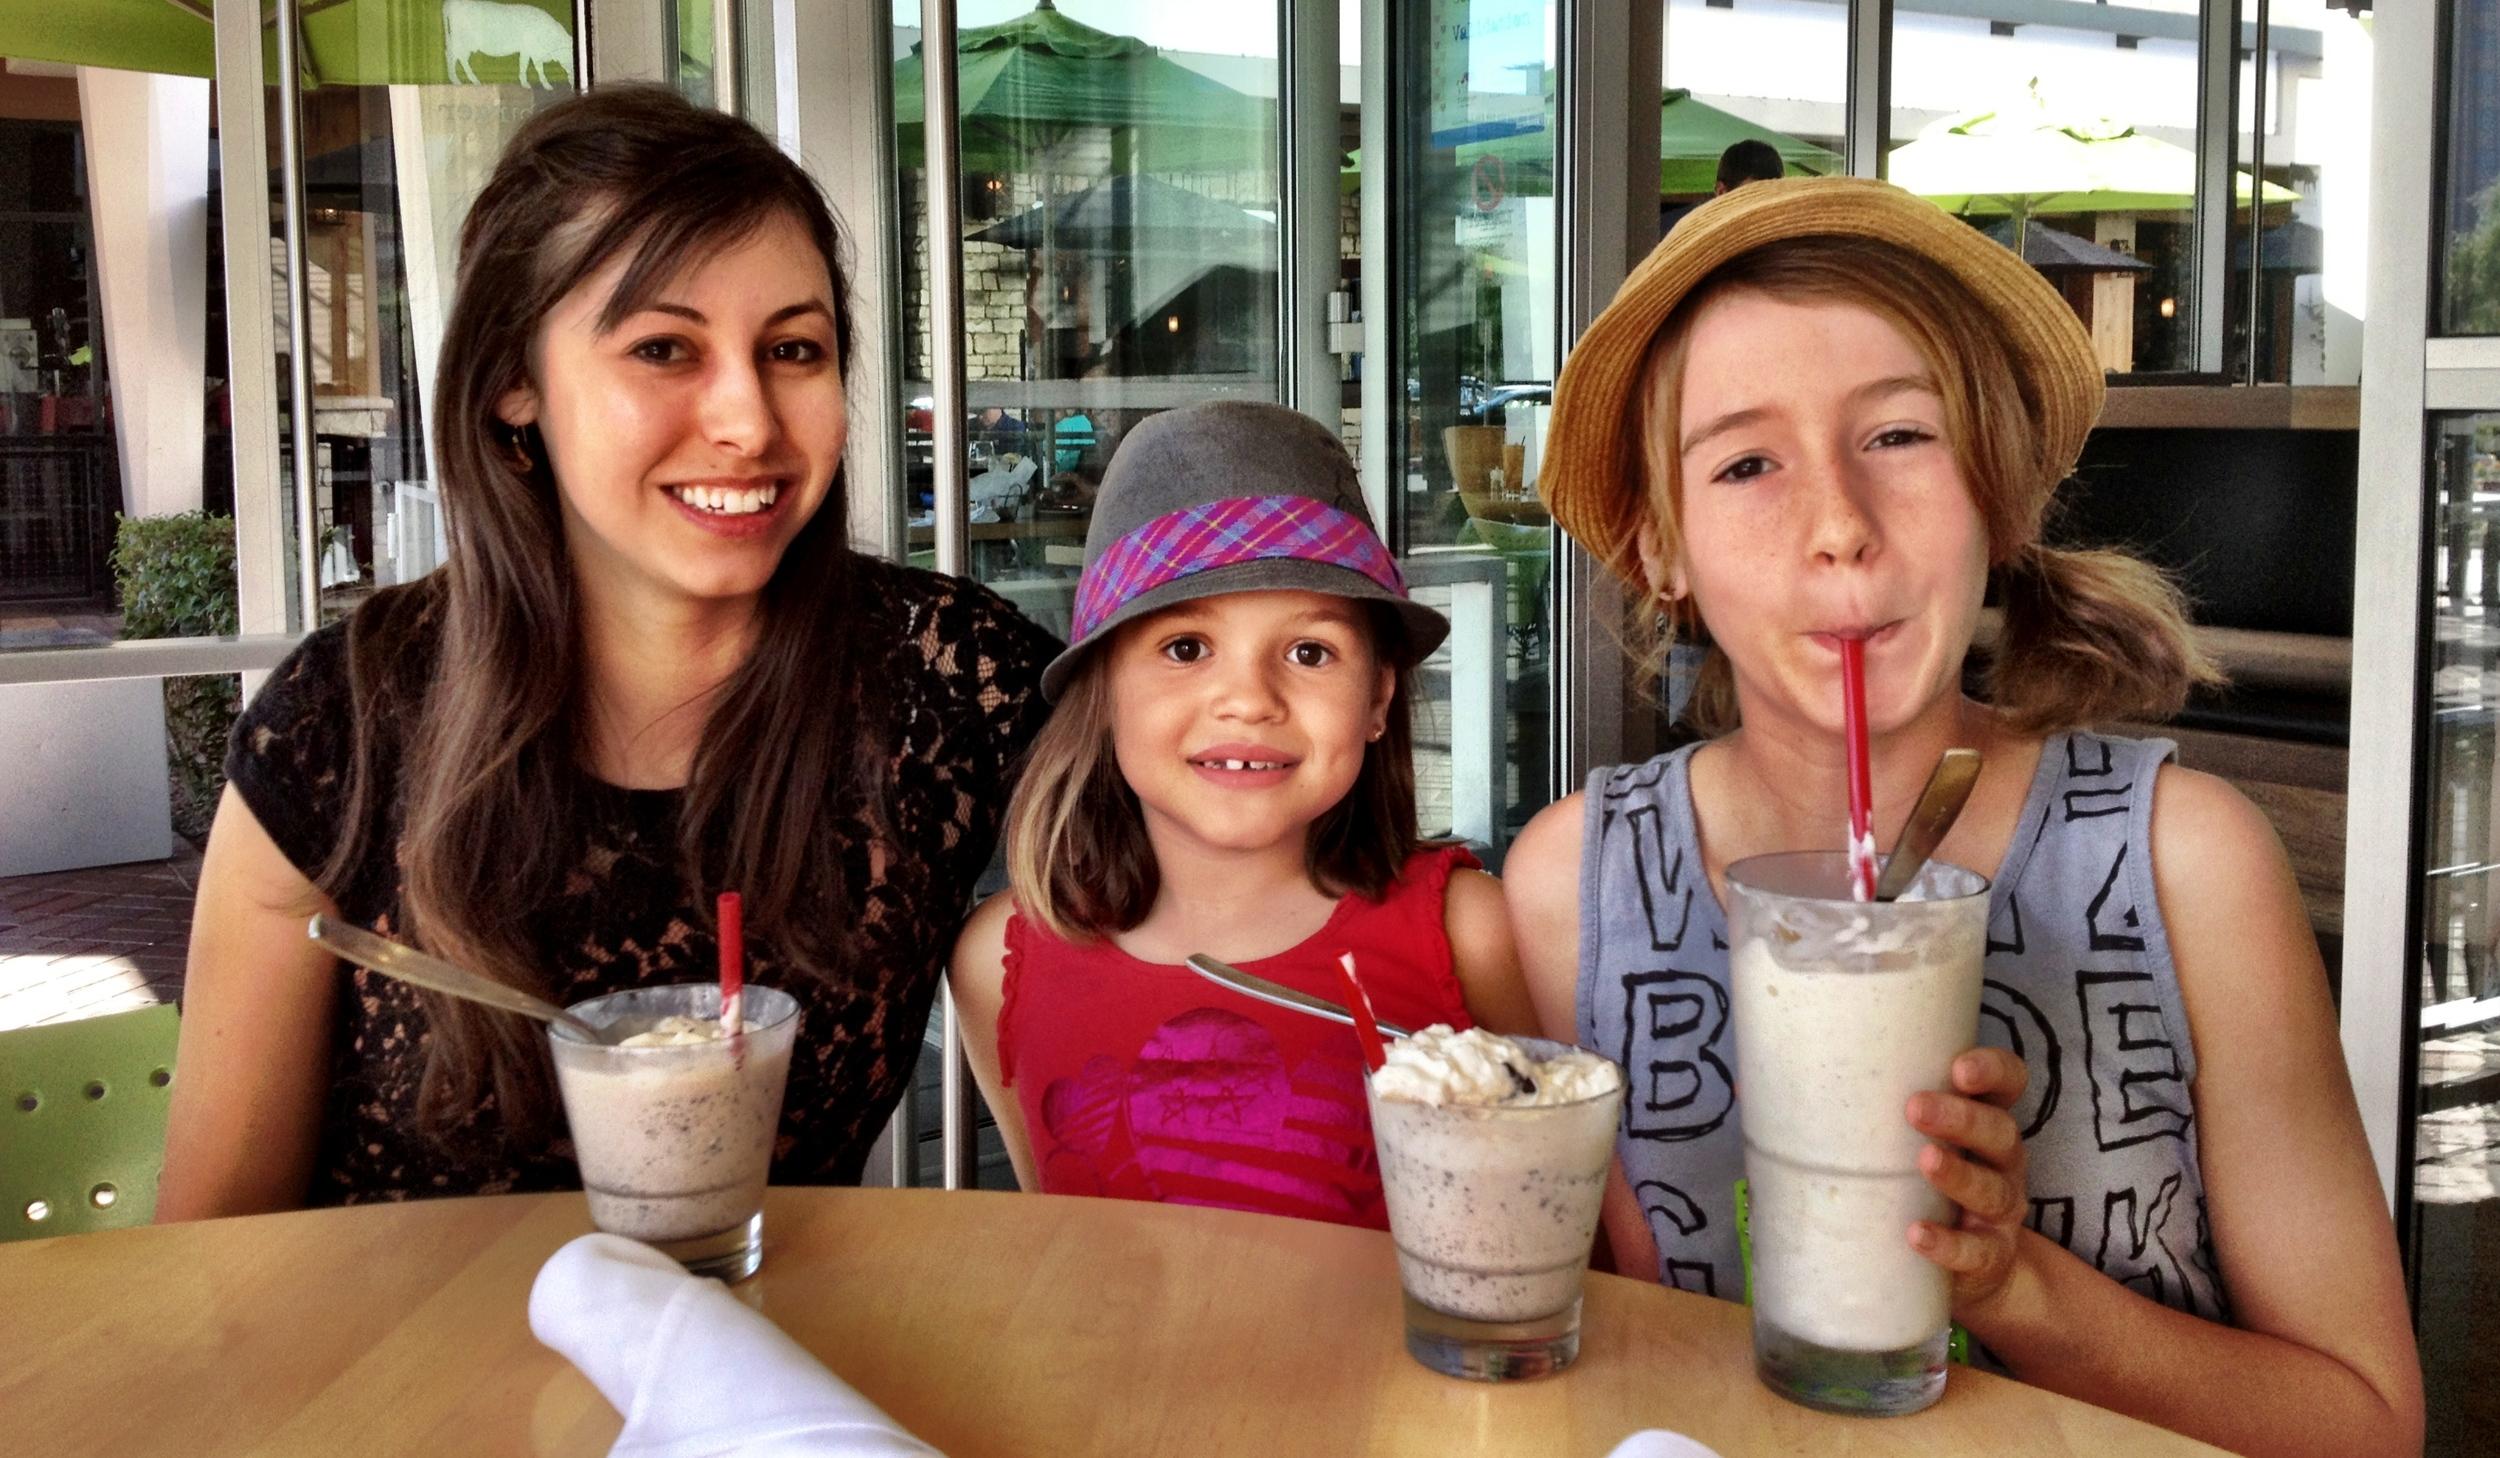 The Candelaria girls - Tiffany, Sophia and Bella